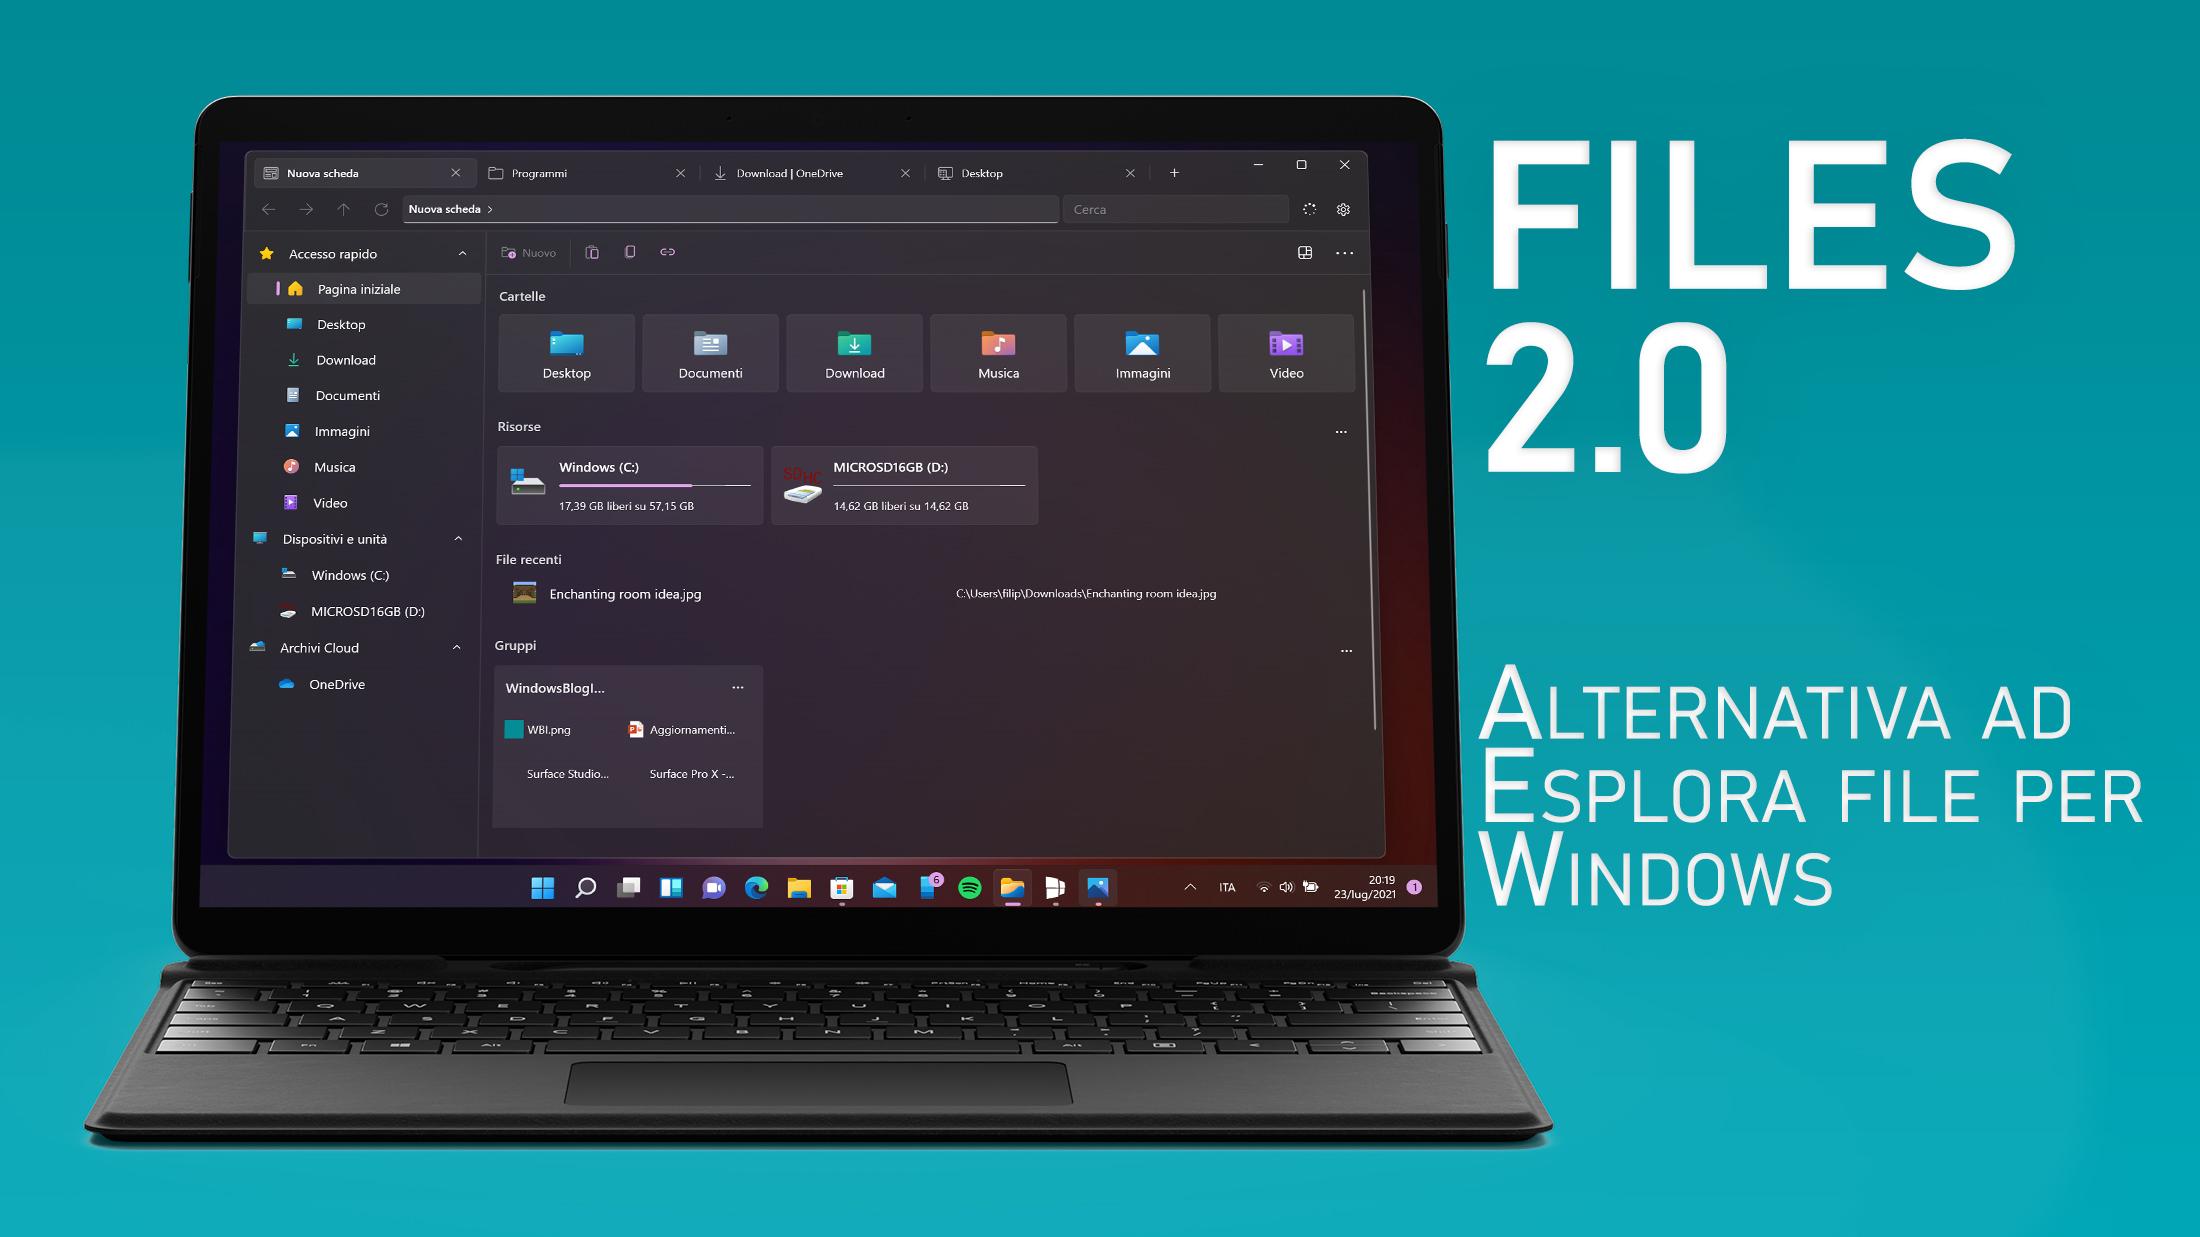 Files 2.0 per Windows - App alternativa ad Esplora file